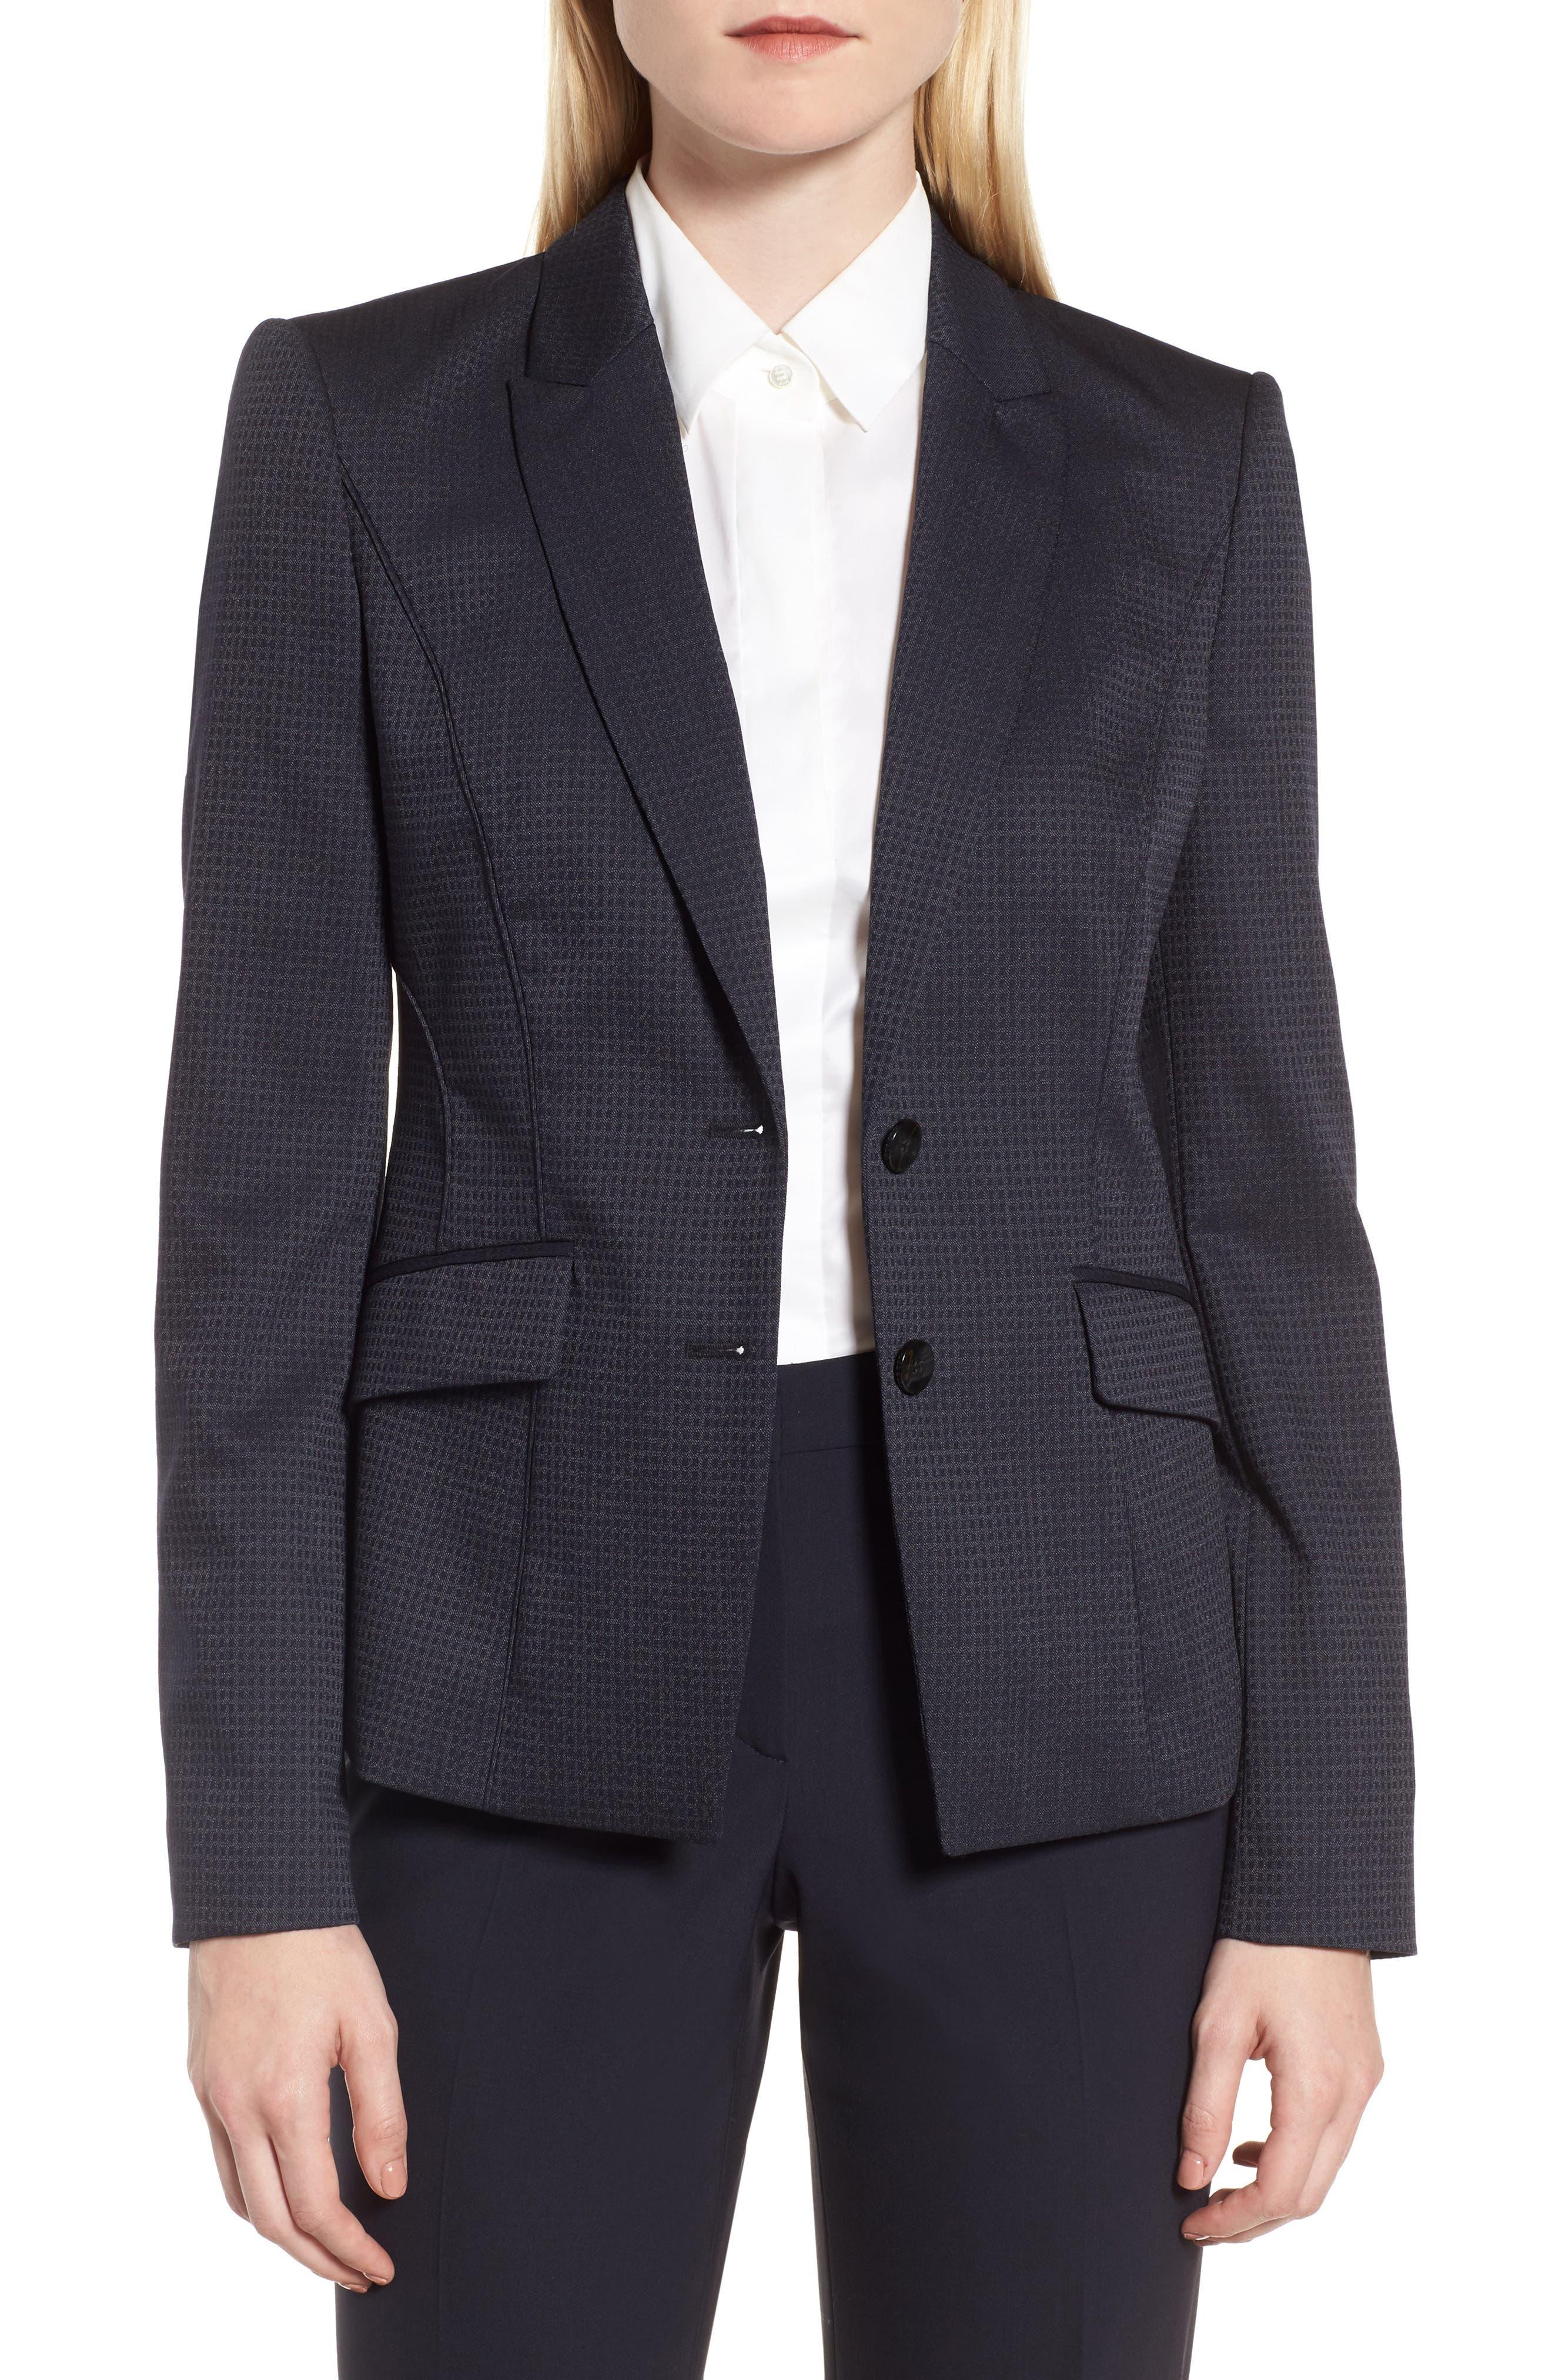 Alternate Image 1 Selected - BOSS Jukani Check Wool Blend Suit Jacket (Petite)